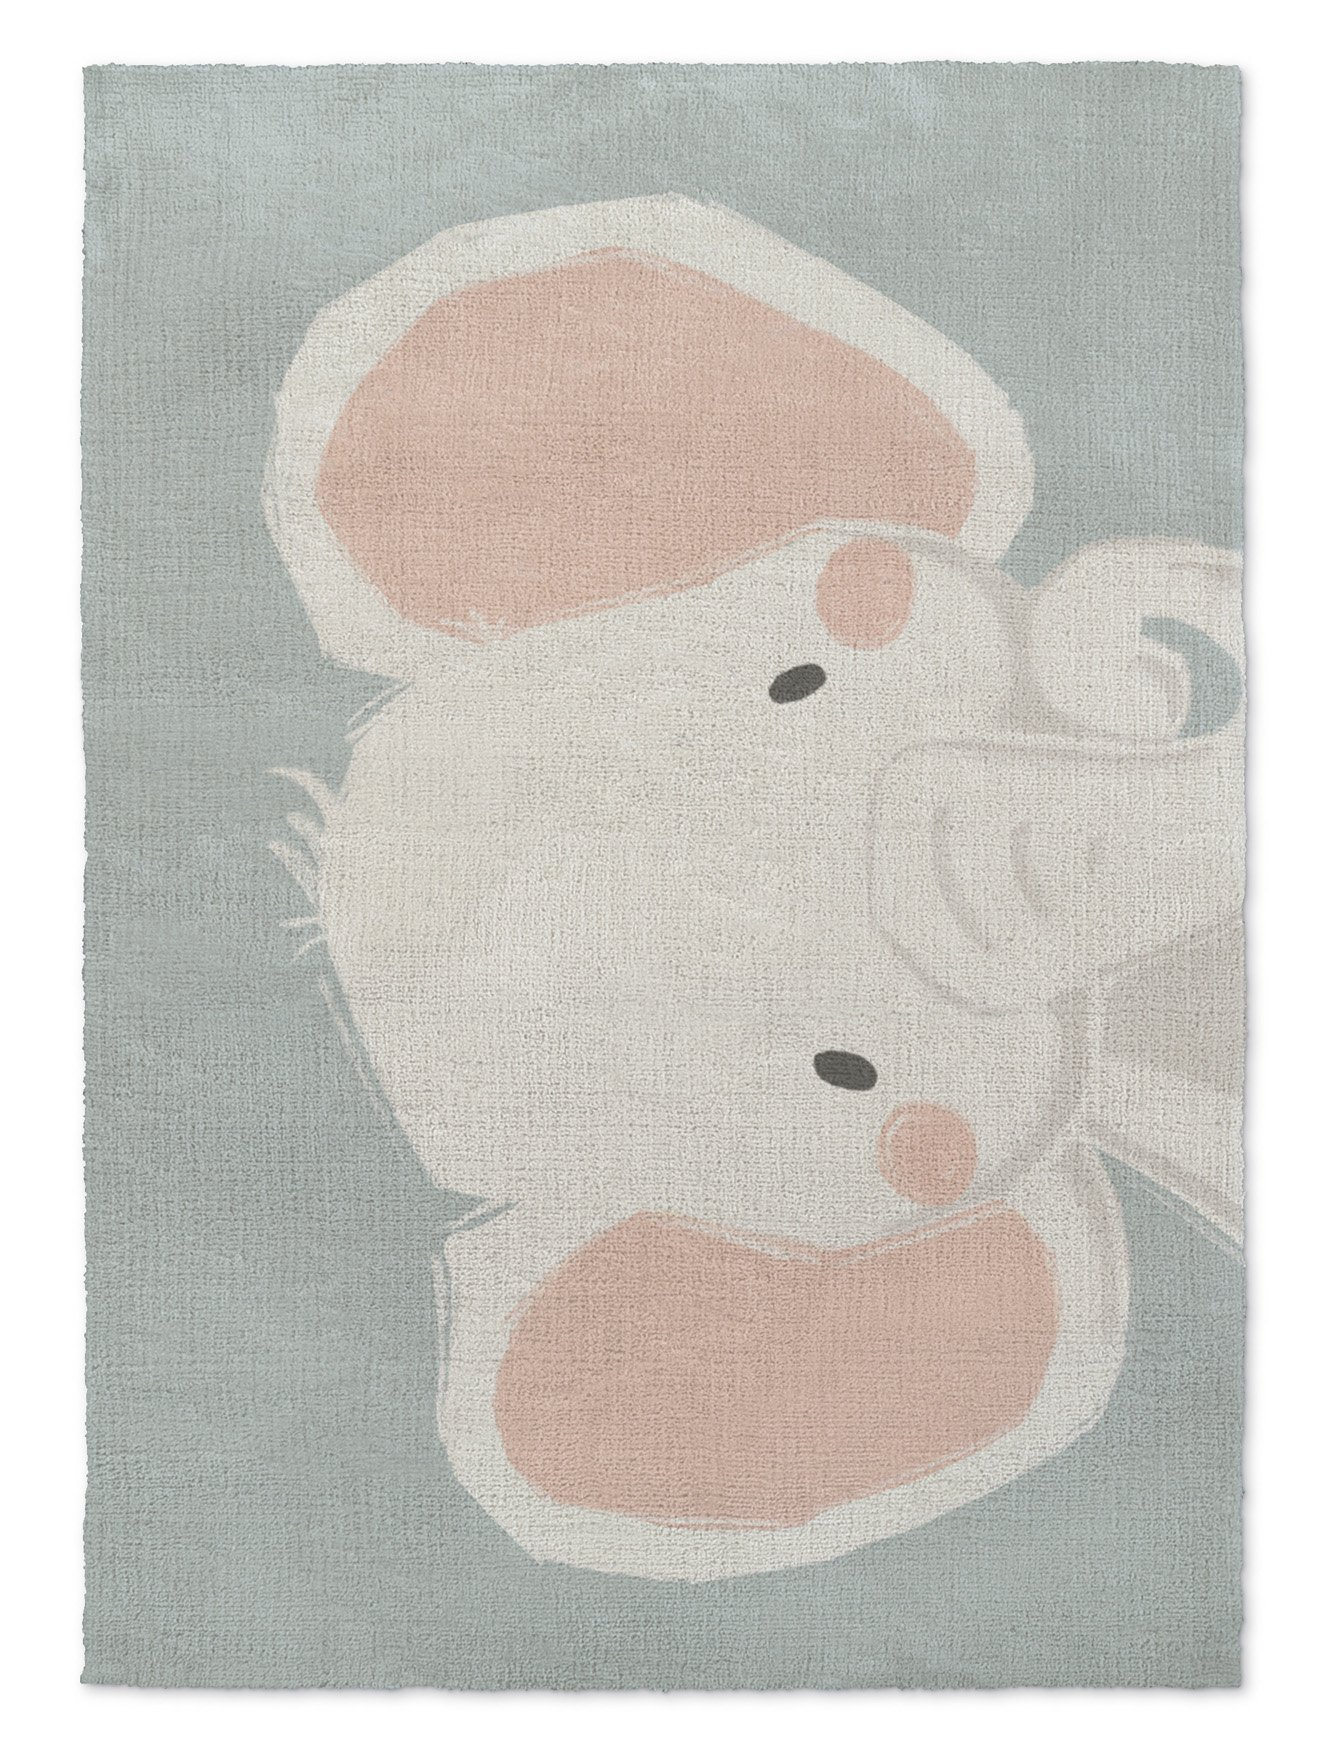 KAVKA Designs Elephant Area Rug, (Blue/Pink) - SHORTSTACK Collection, Size: 3x5x.5 - (JLJAVC011RUG35)